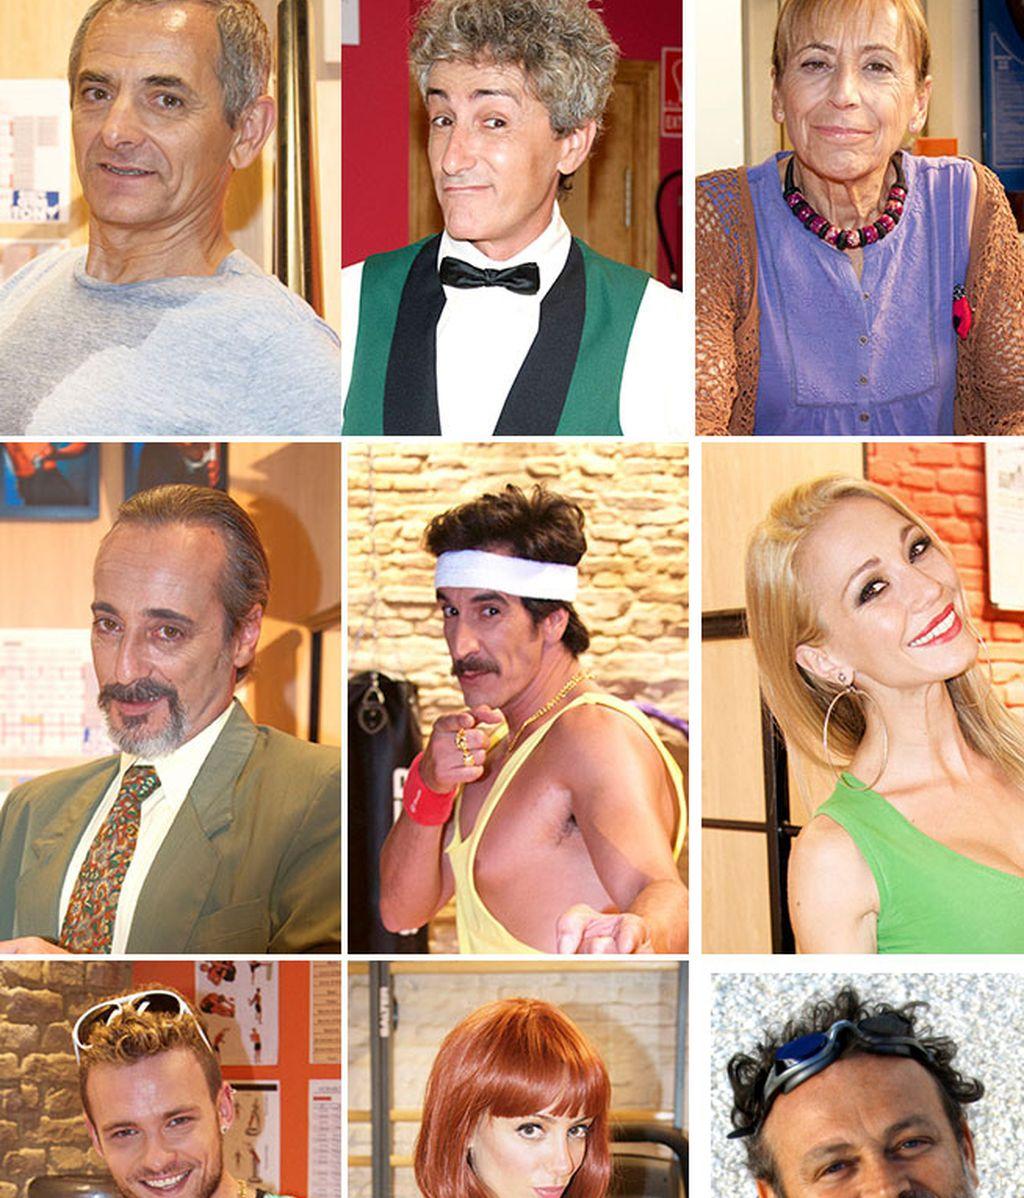 La comedia coral, liderada por Iván Massagué, roza el 10% en verano